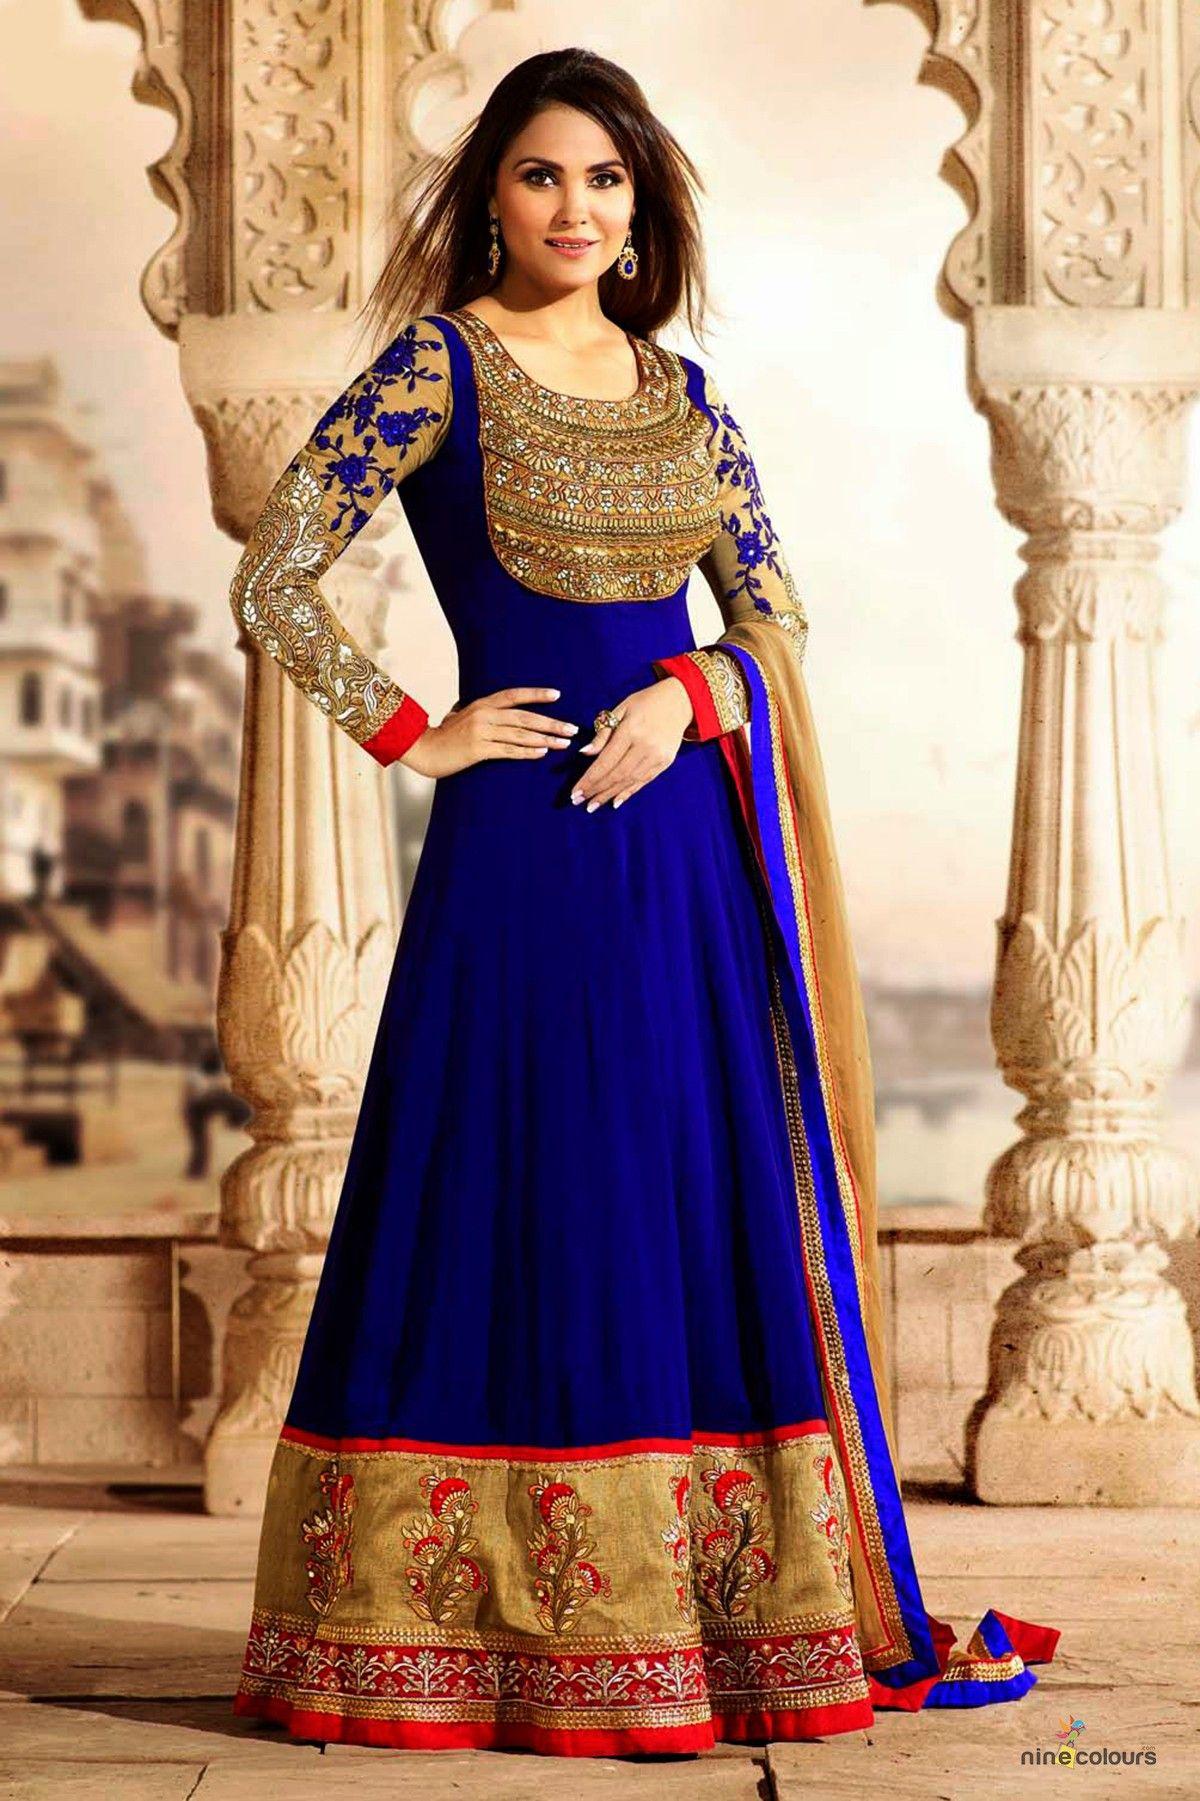 Lara Dutta Mo Fashion Womens Kurtas Kurtis Salwar Kameez